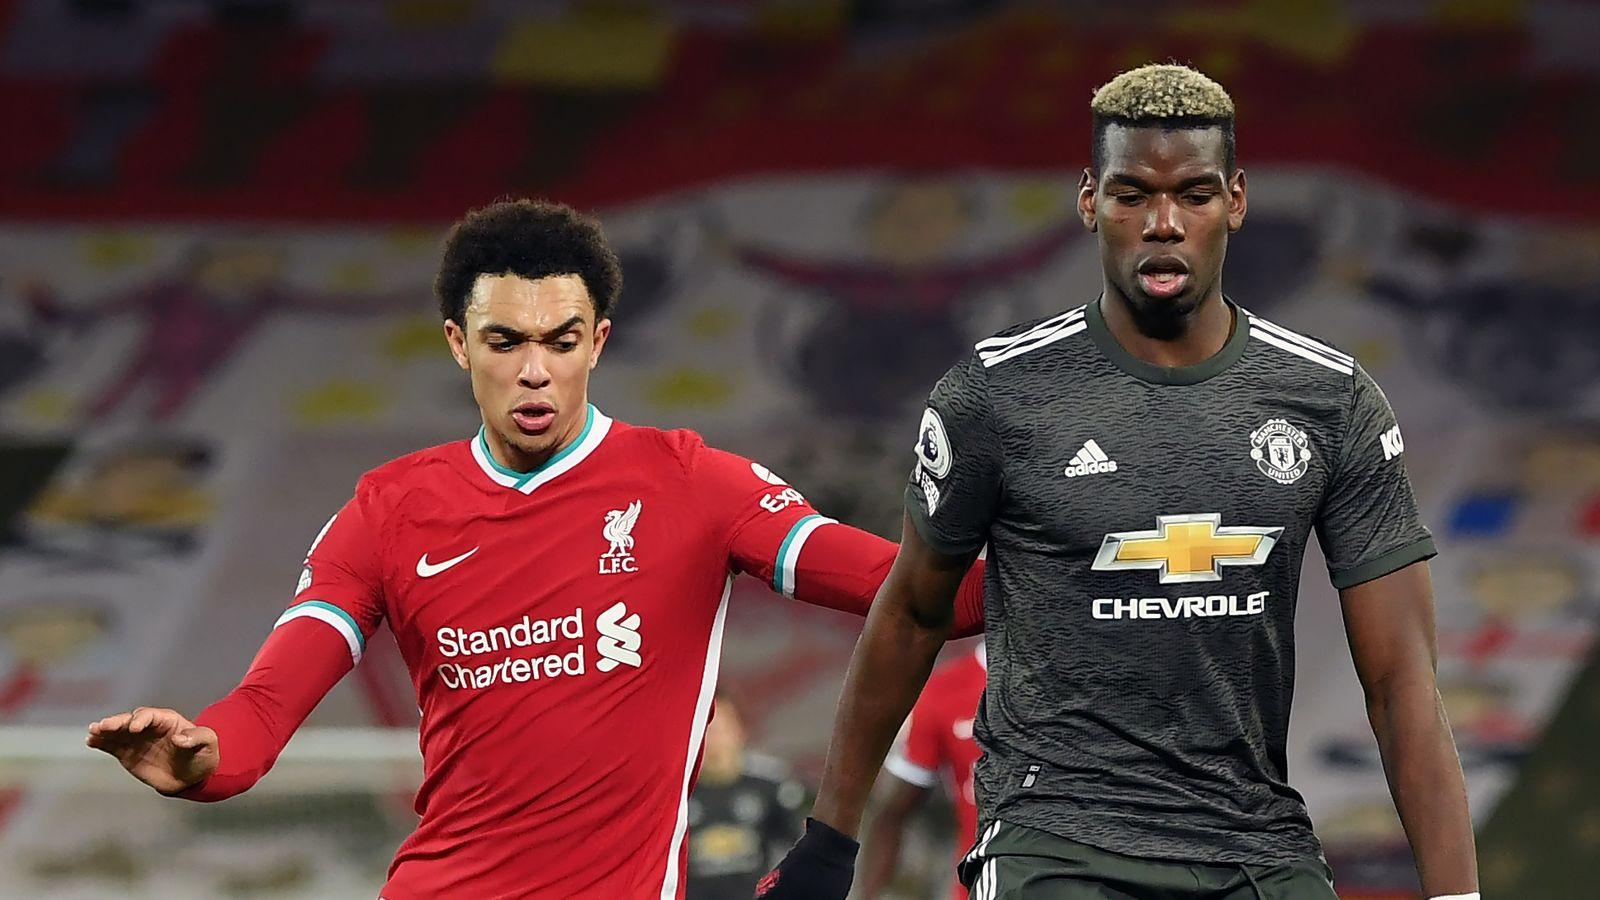 Liverpool-Man Utd kit clash 'angers'